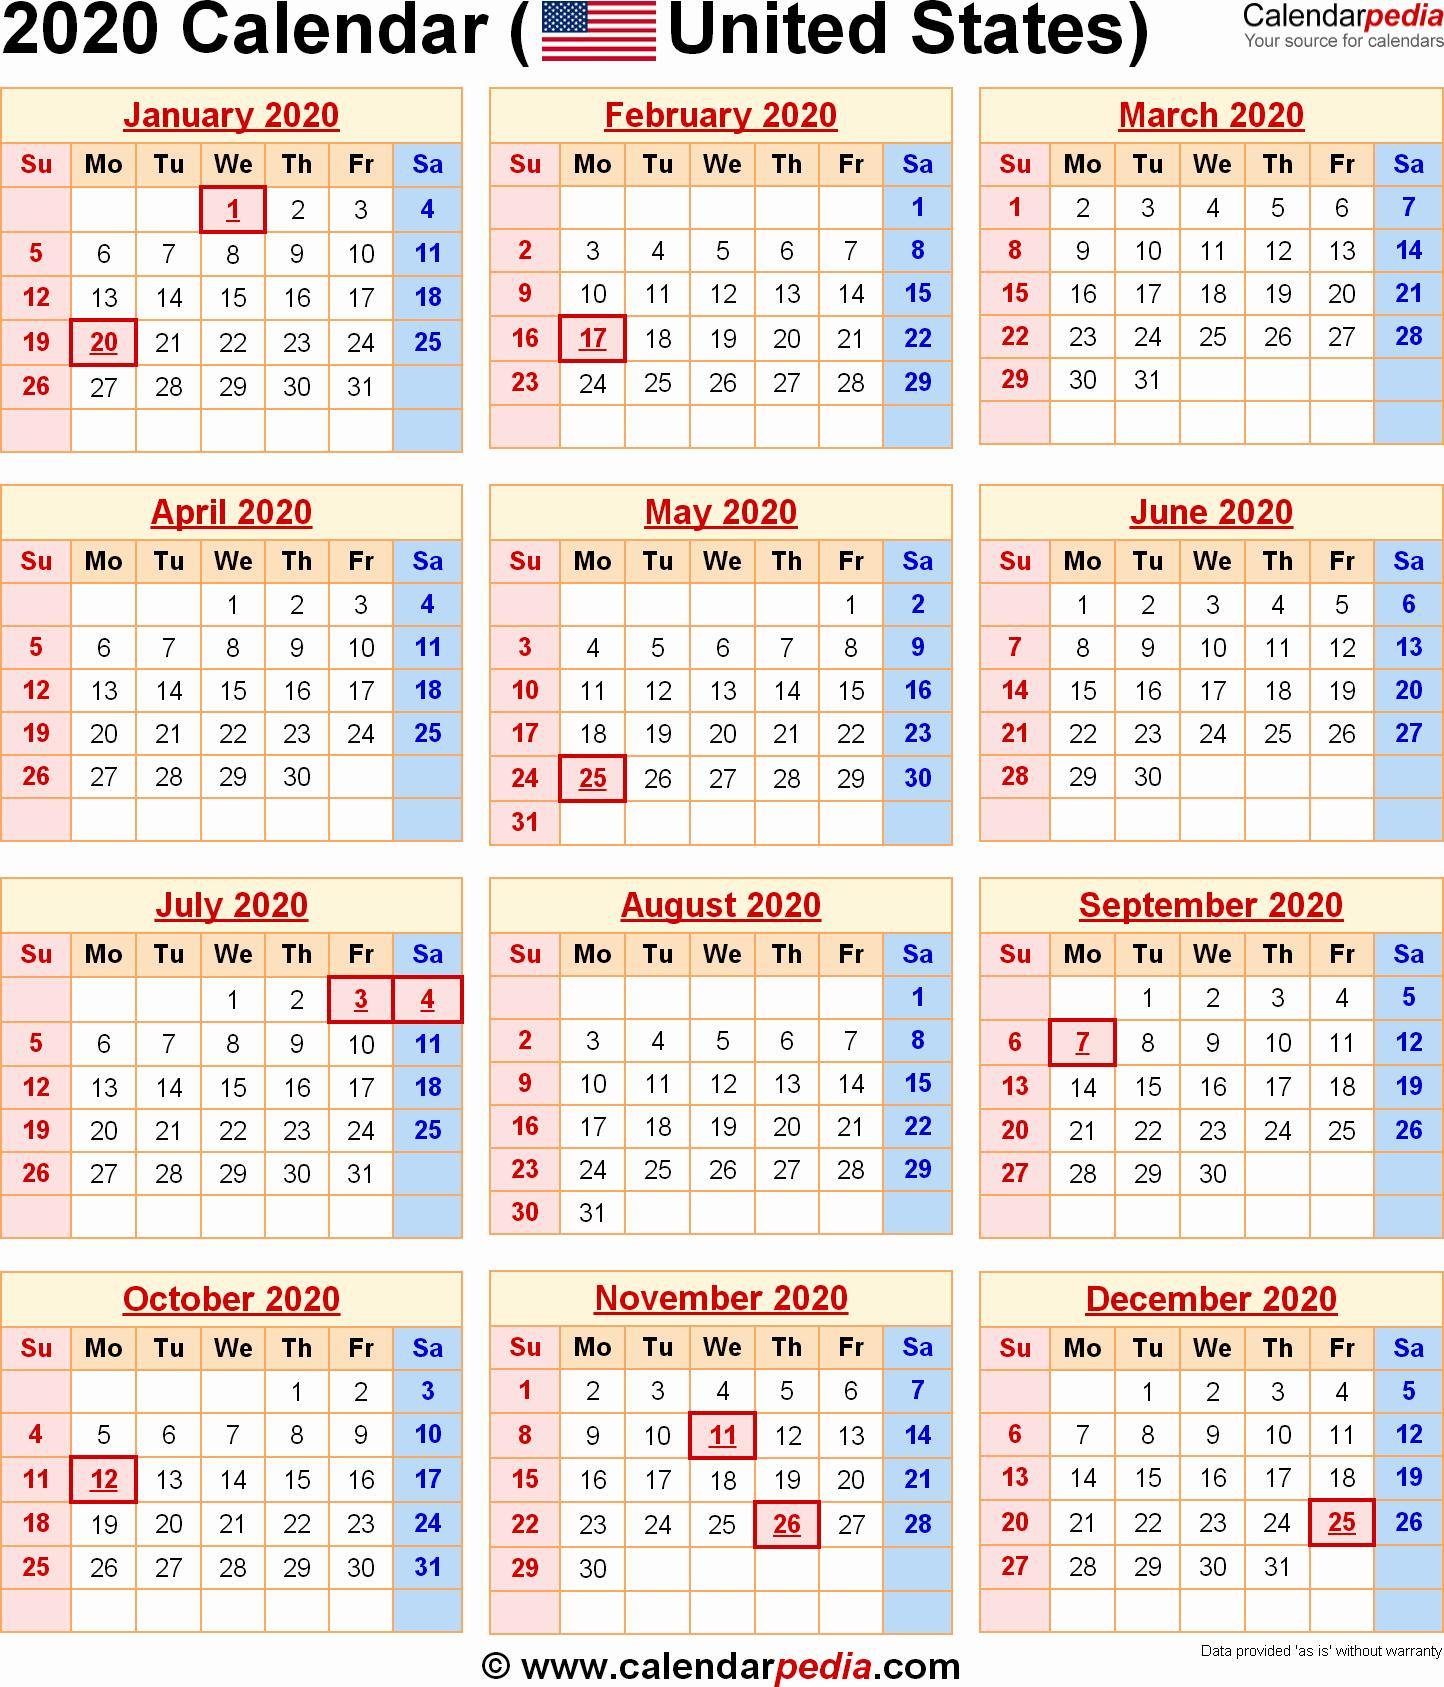 2020 Calendar Wallpapers - Wallpaper Cave regarding 2022 Federal Payroll Calendar Printable